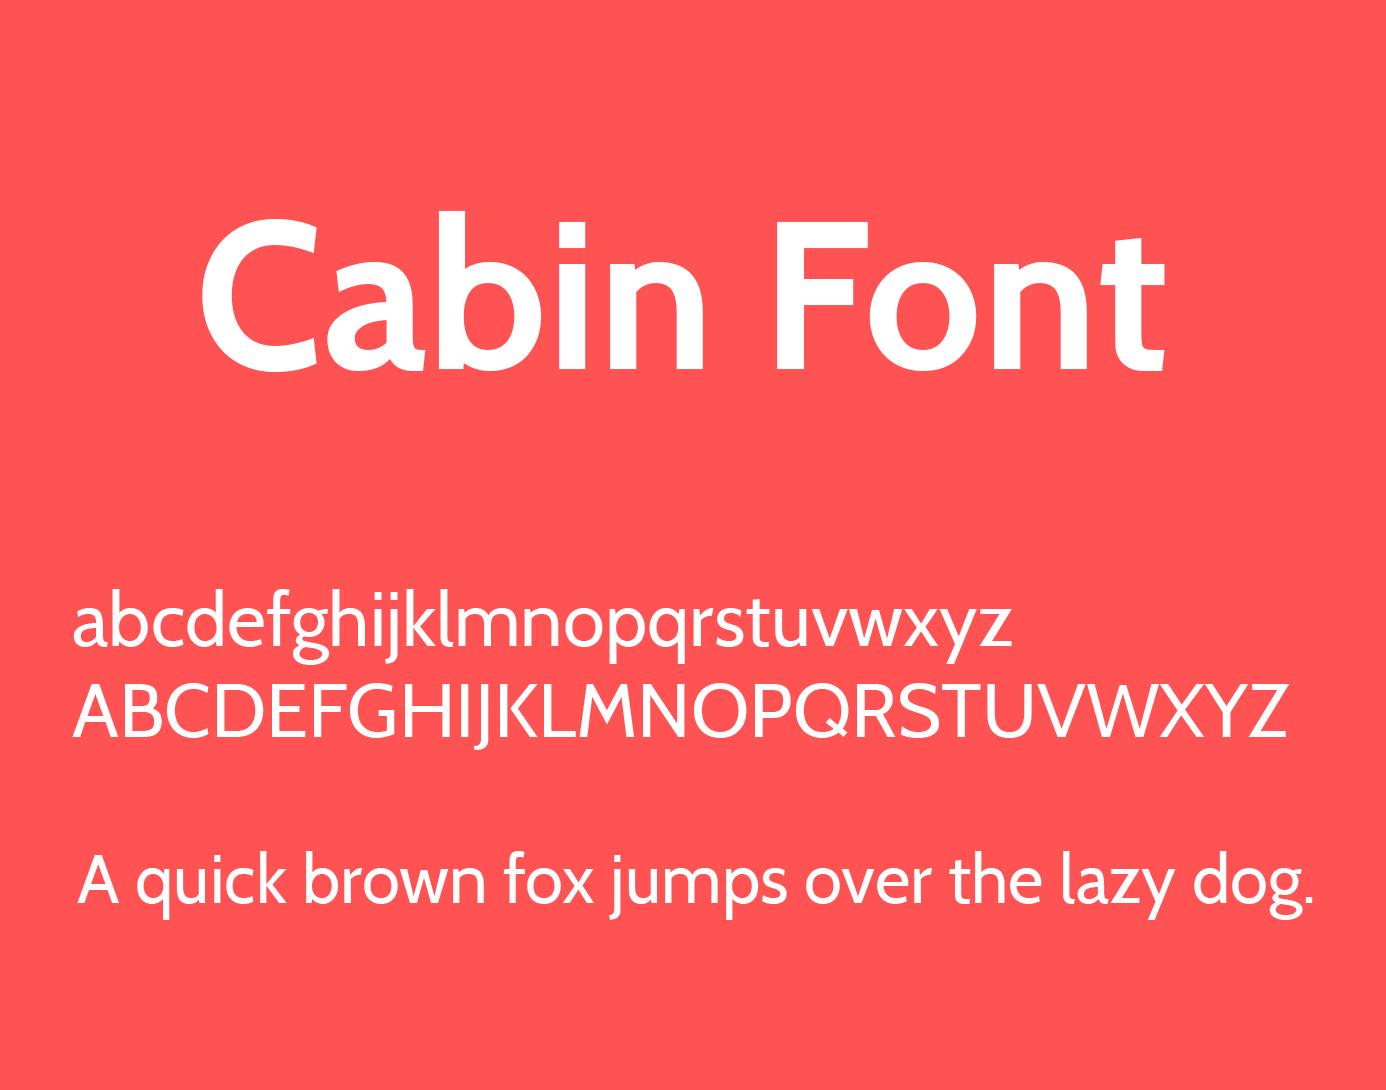 cabin-font